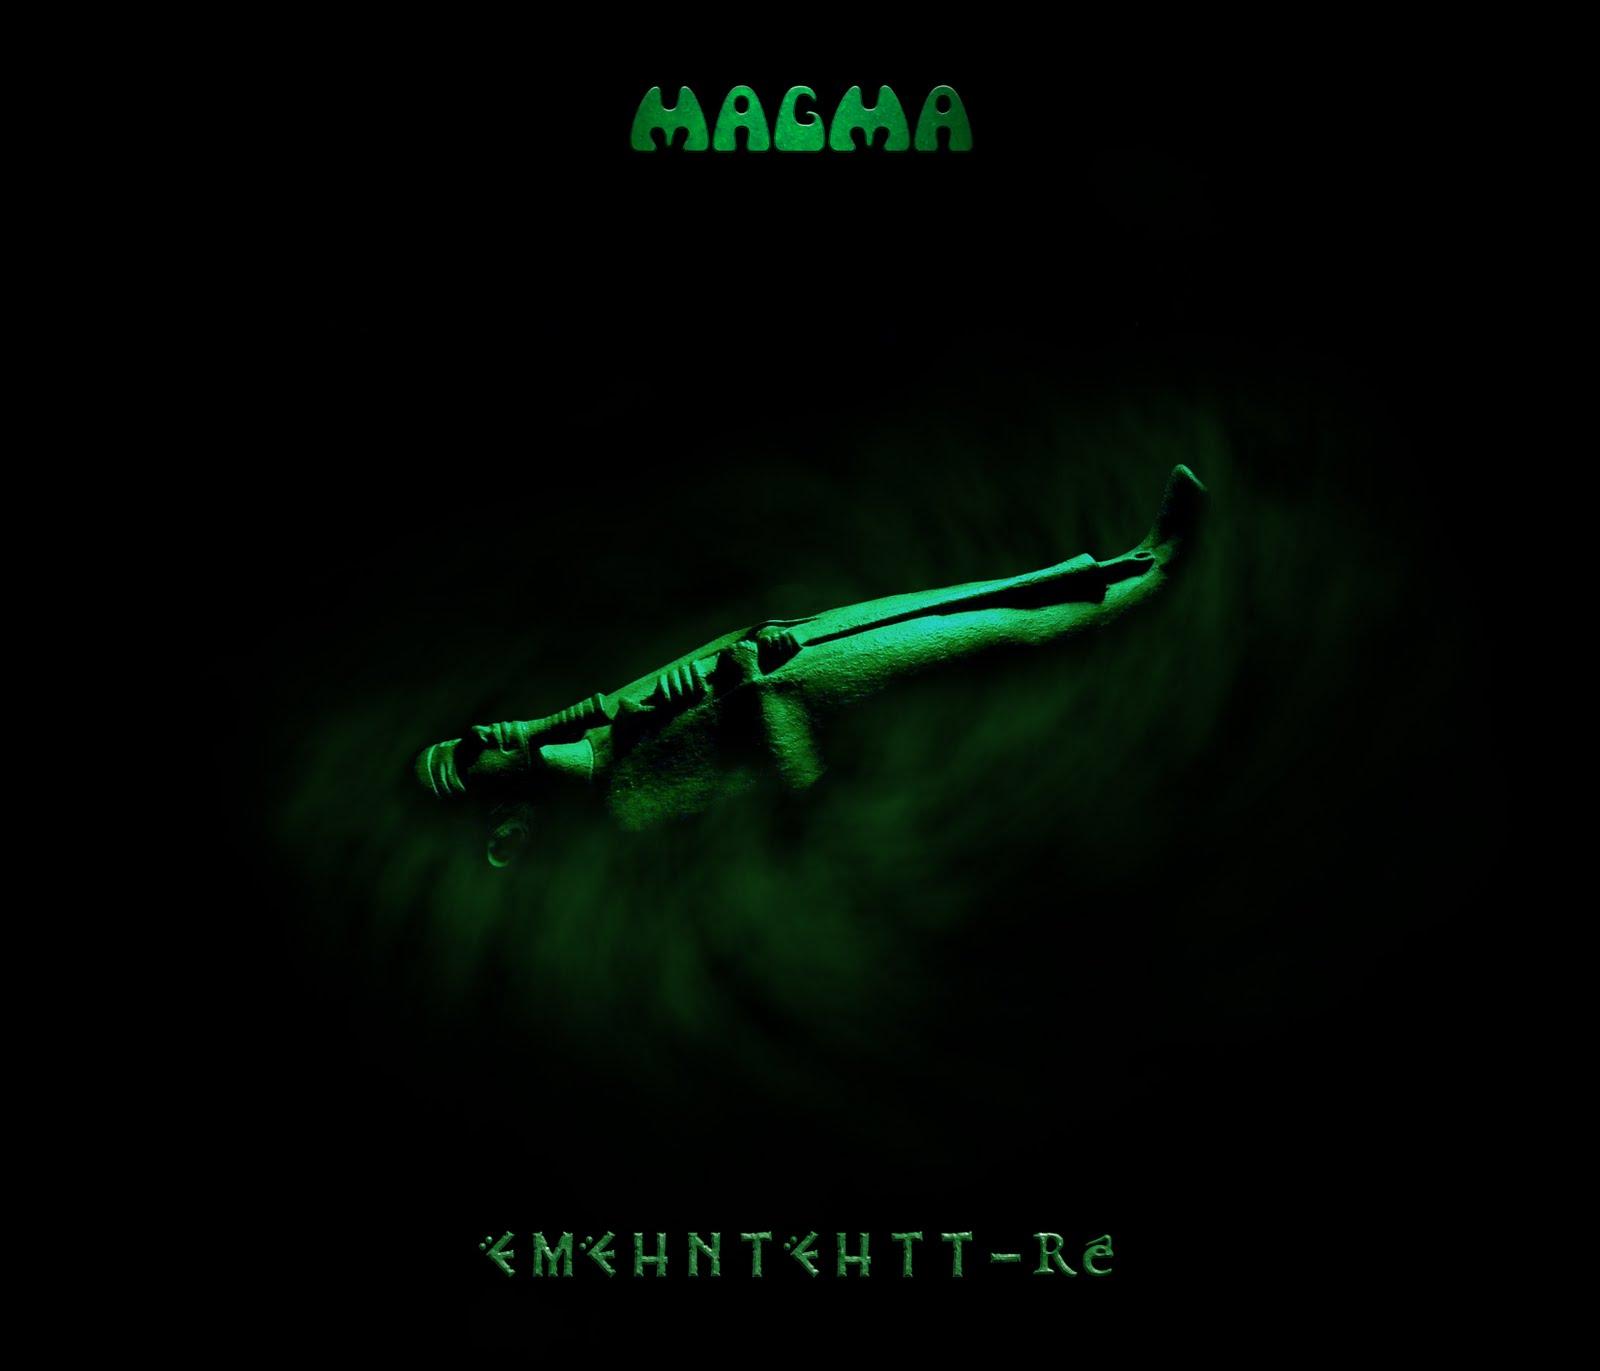 Ретро сборники магма 19 фотография